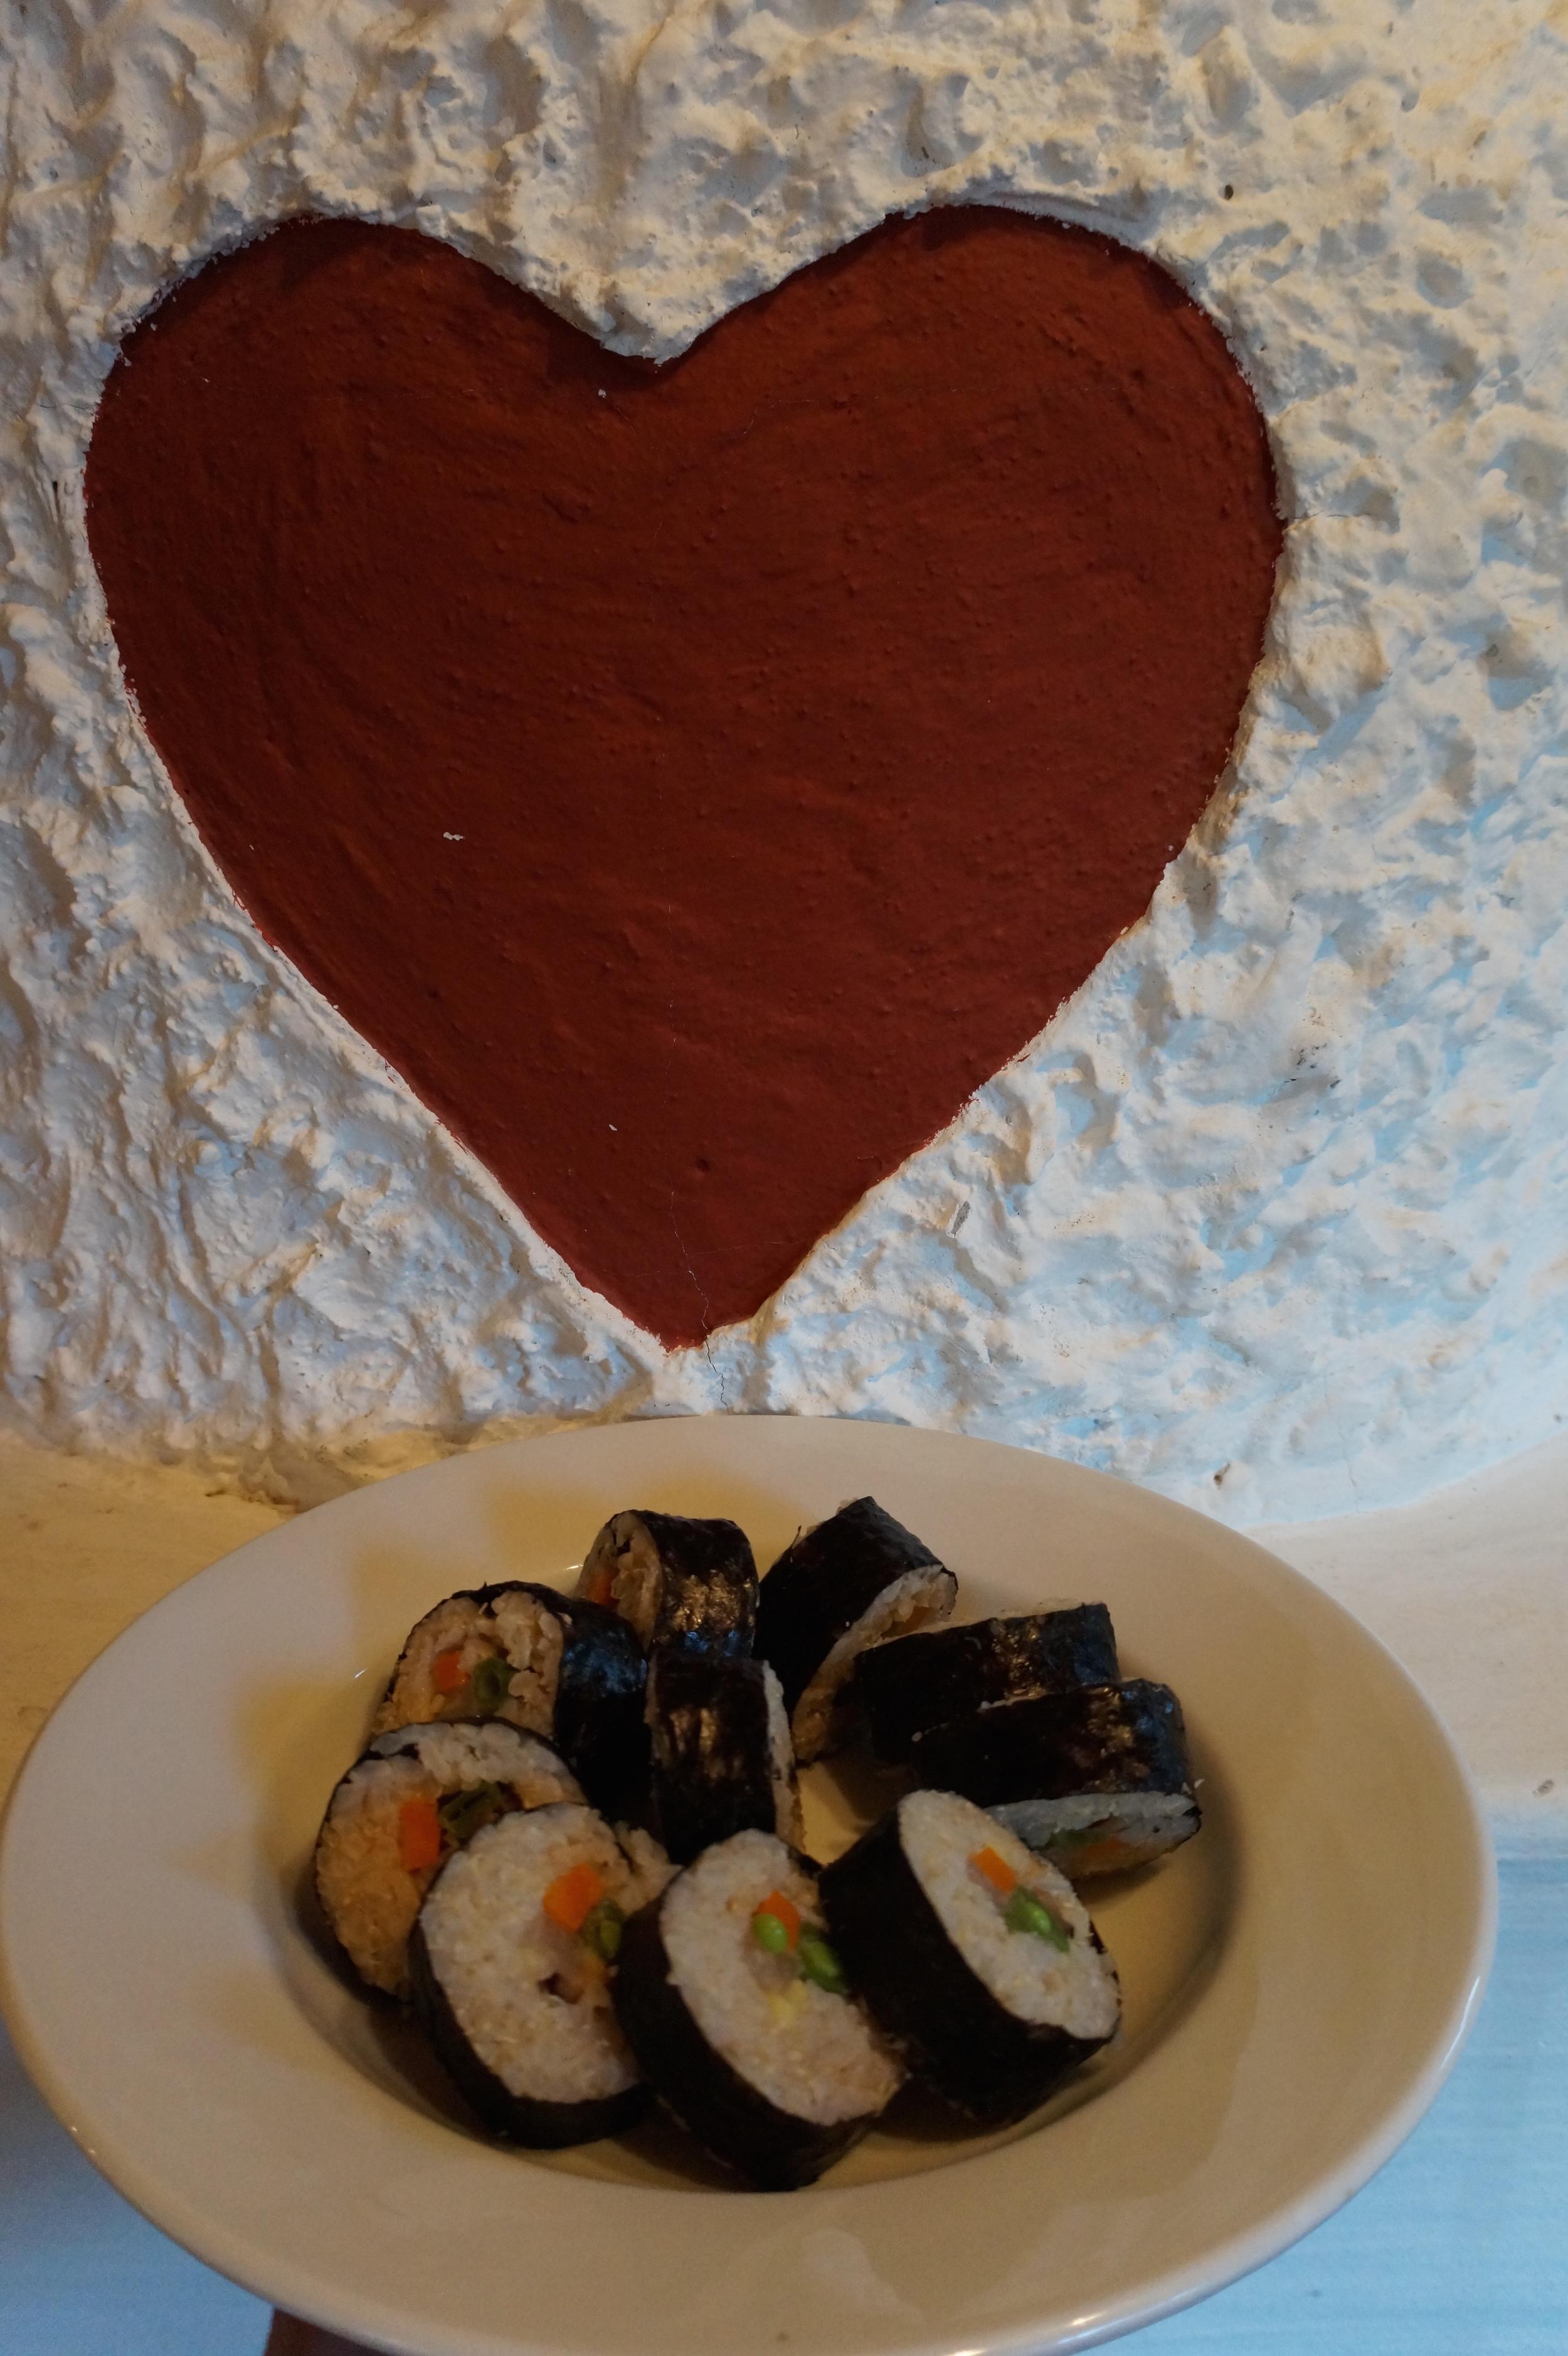 Gotta love vegan brown rice sushi in the land of Schnitzel